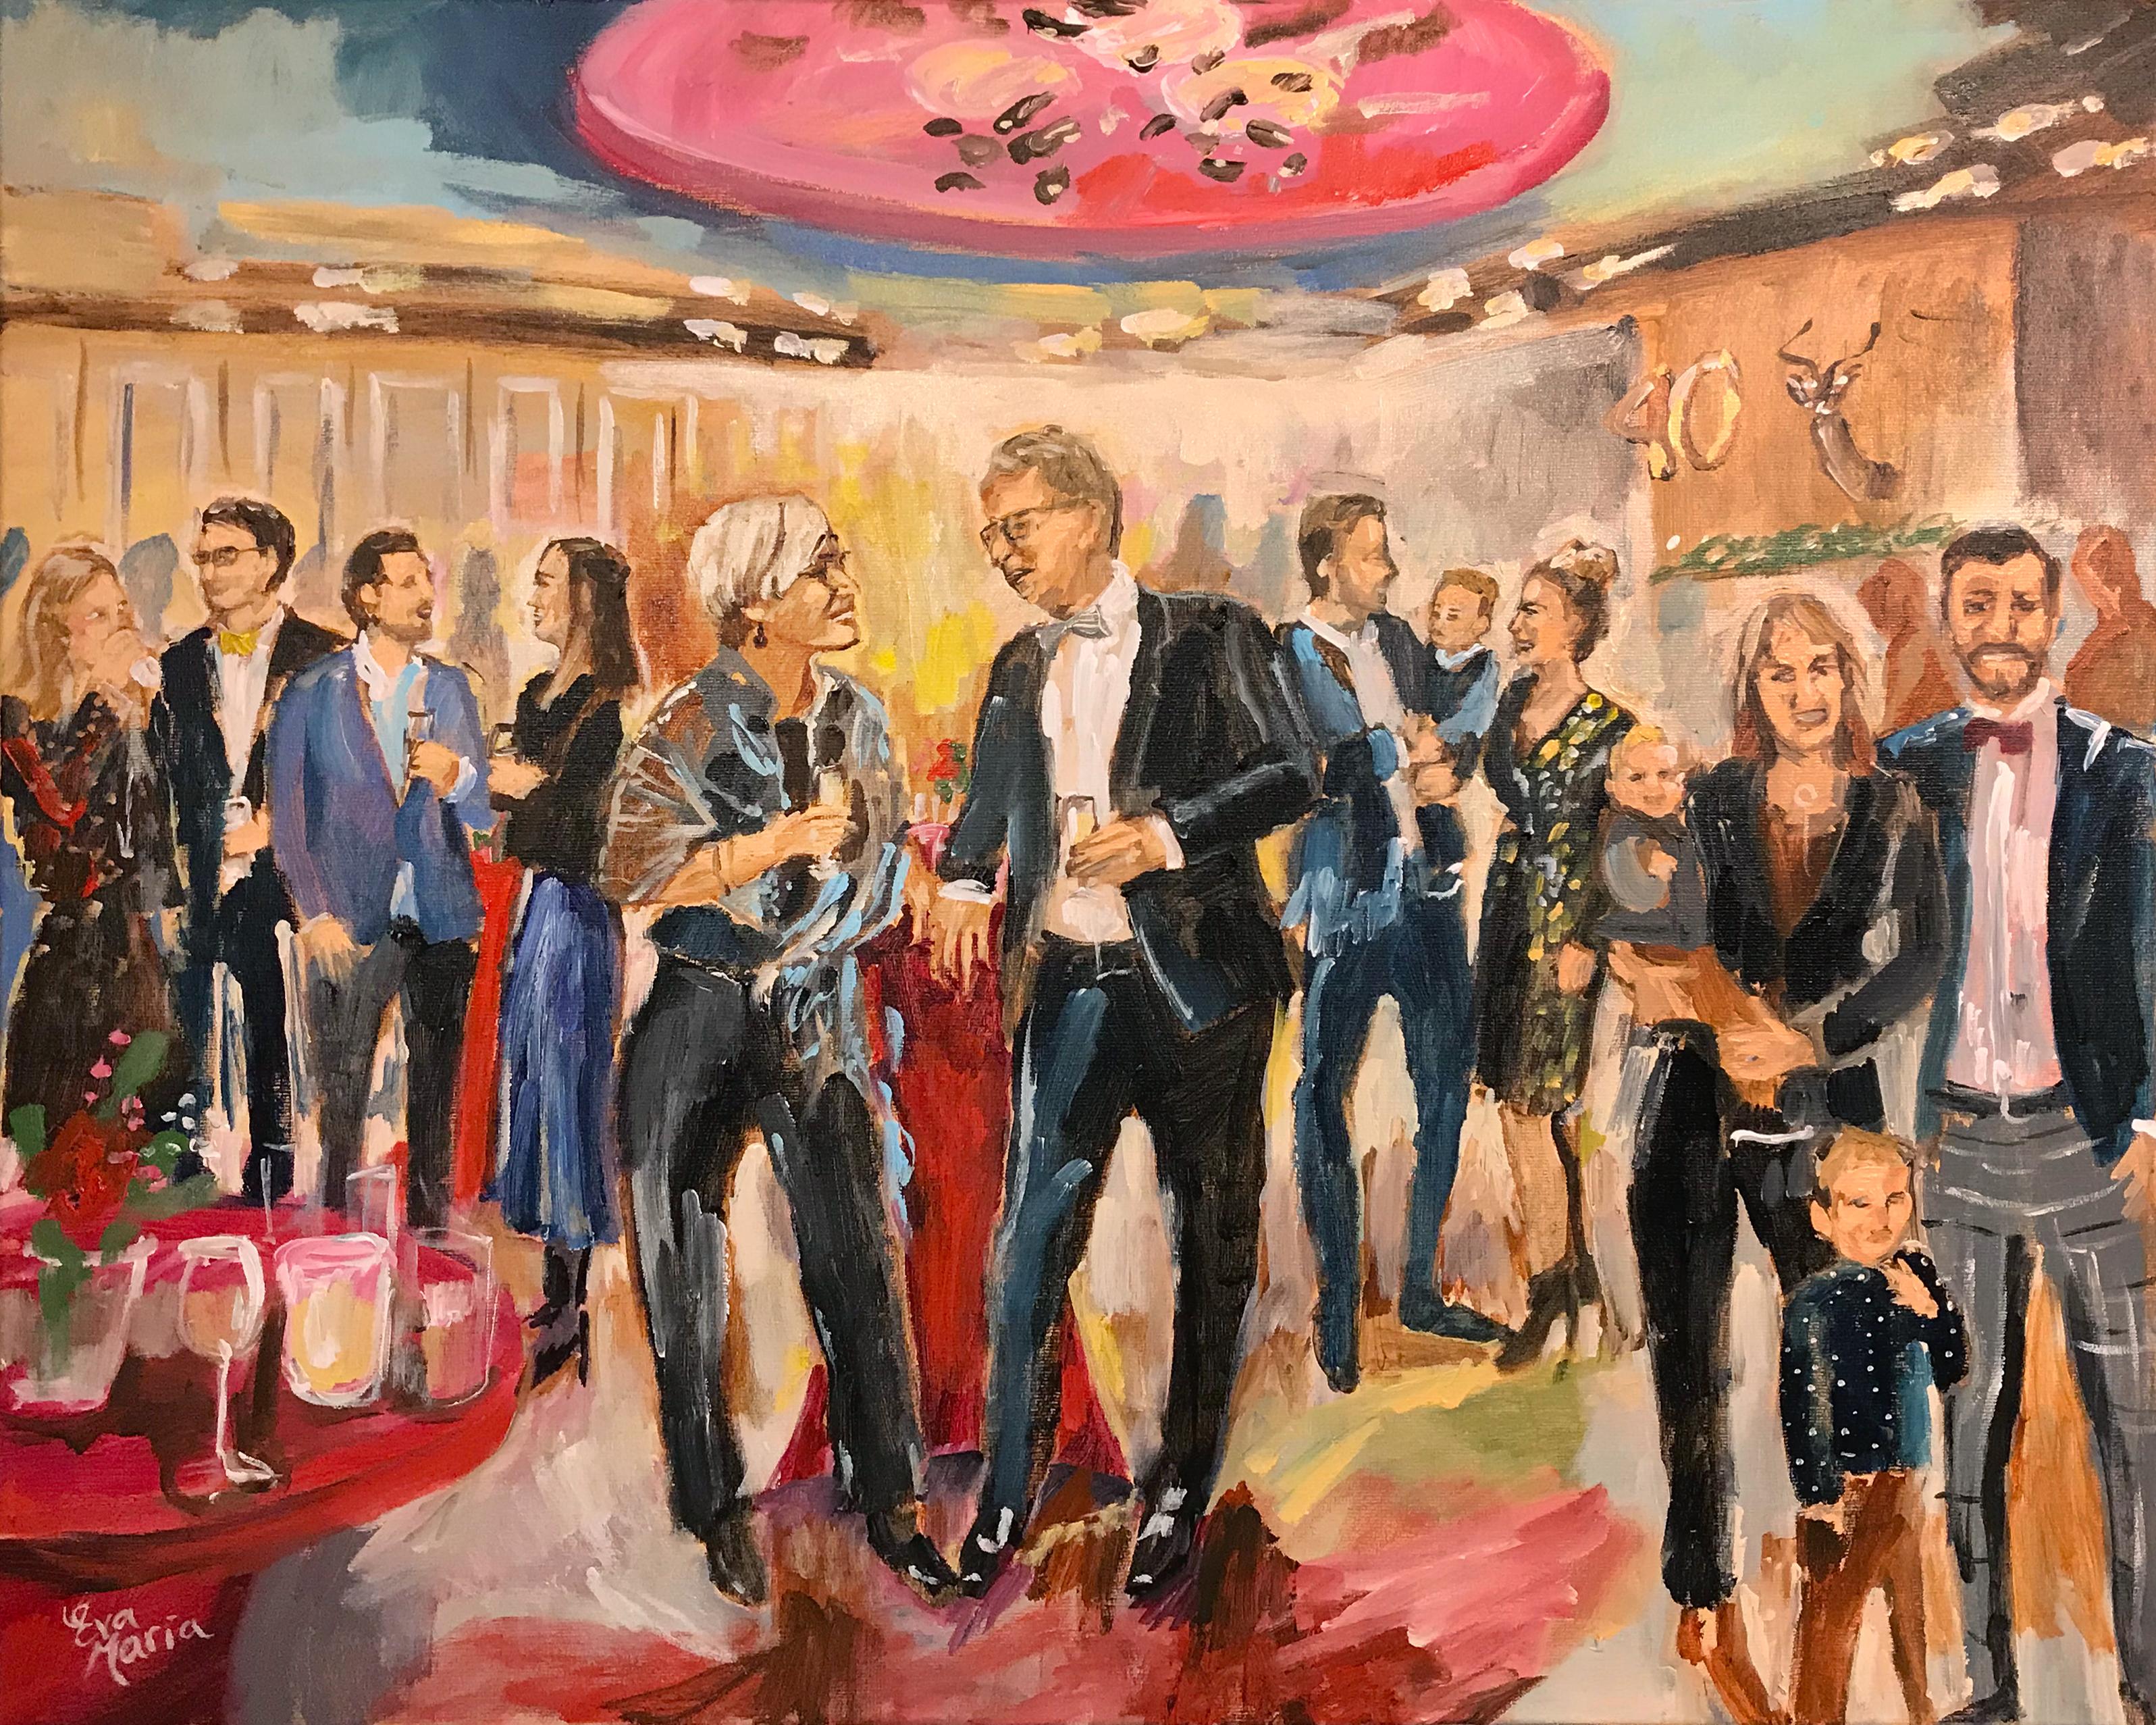 Live Paint Eva Maria Vorden